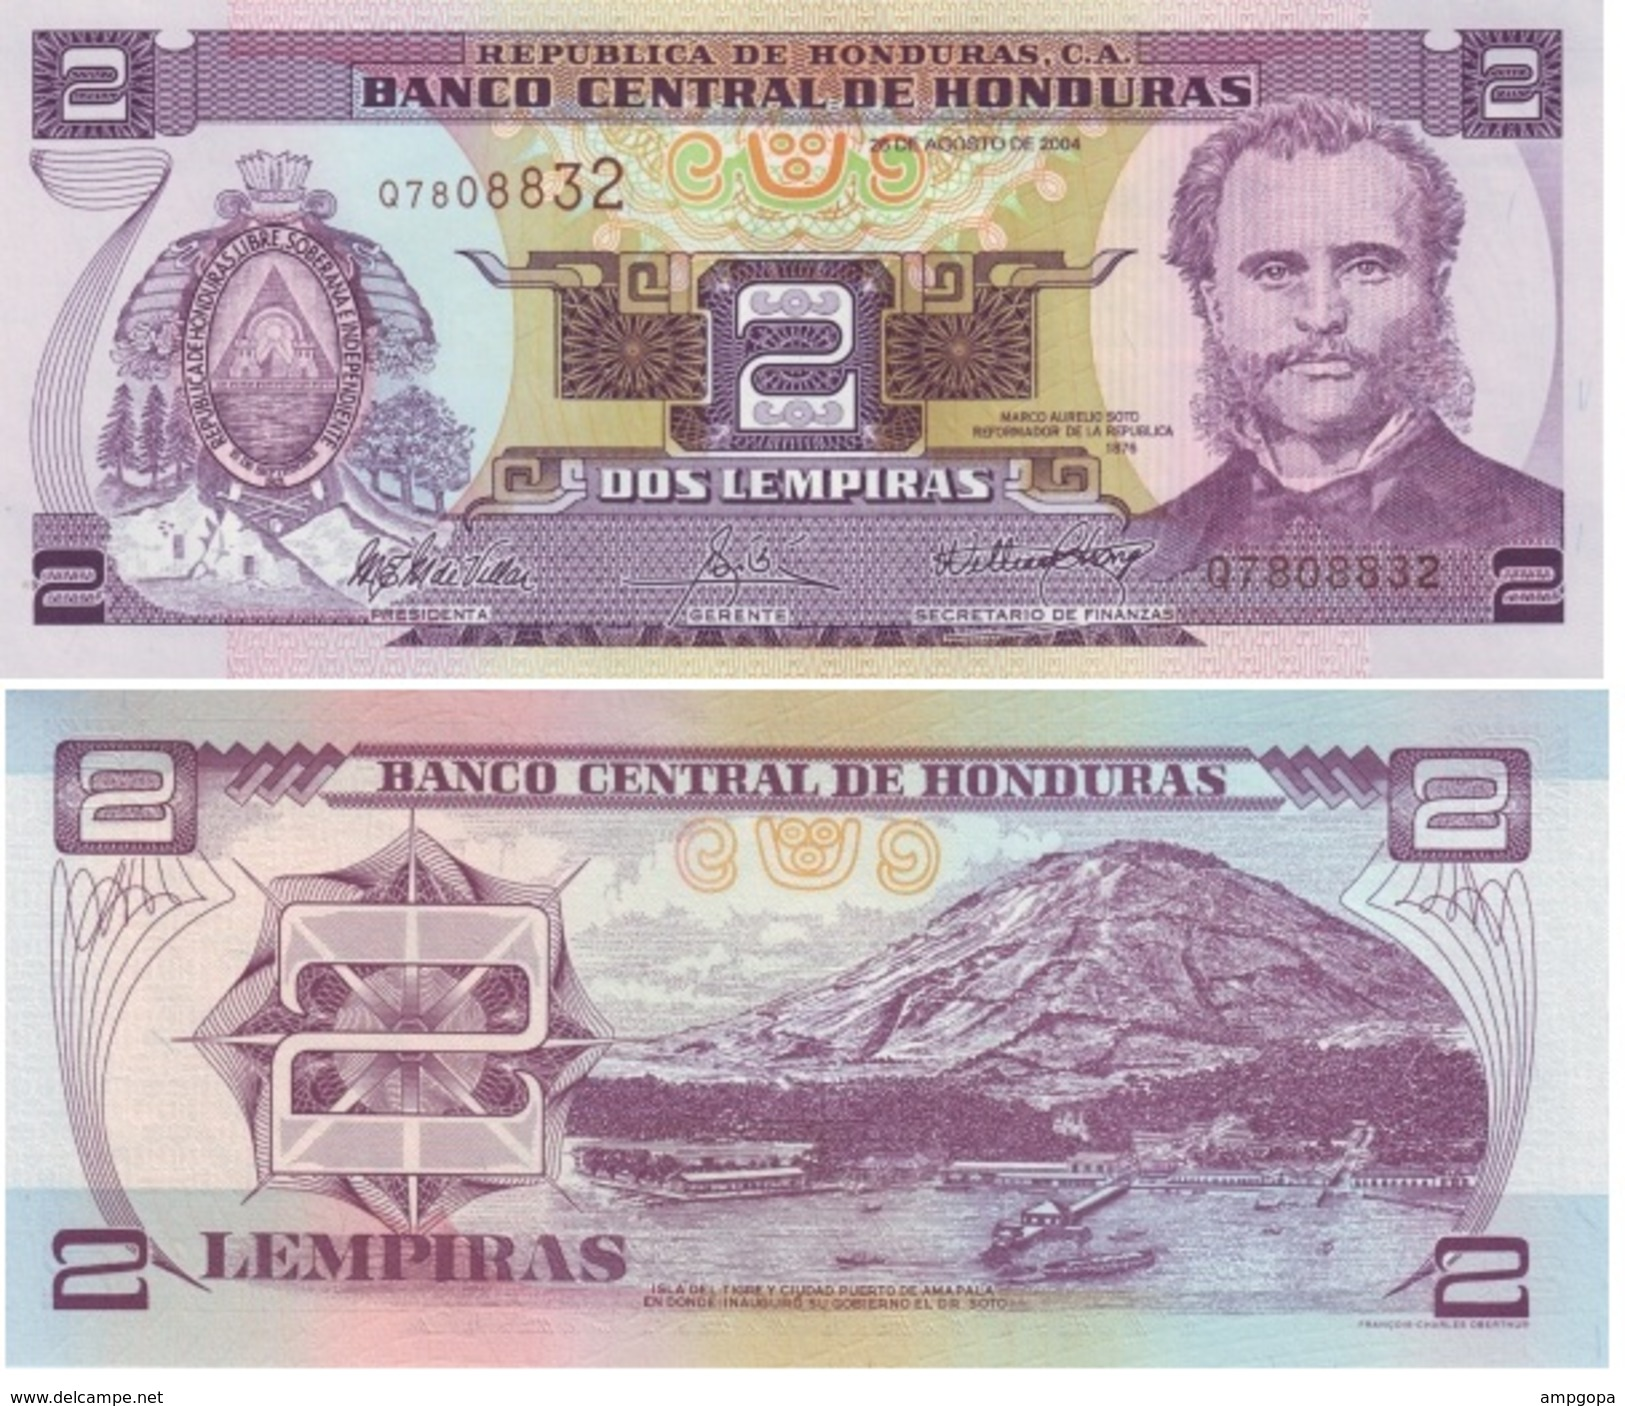 Honduras 2 Lempiras 2004 Pick 80A.e UNC - Honduras